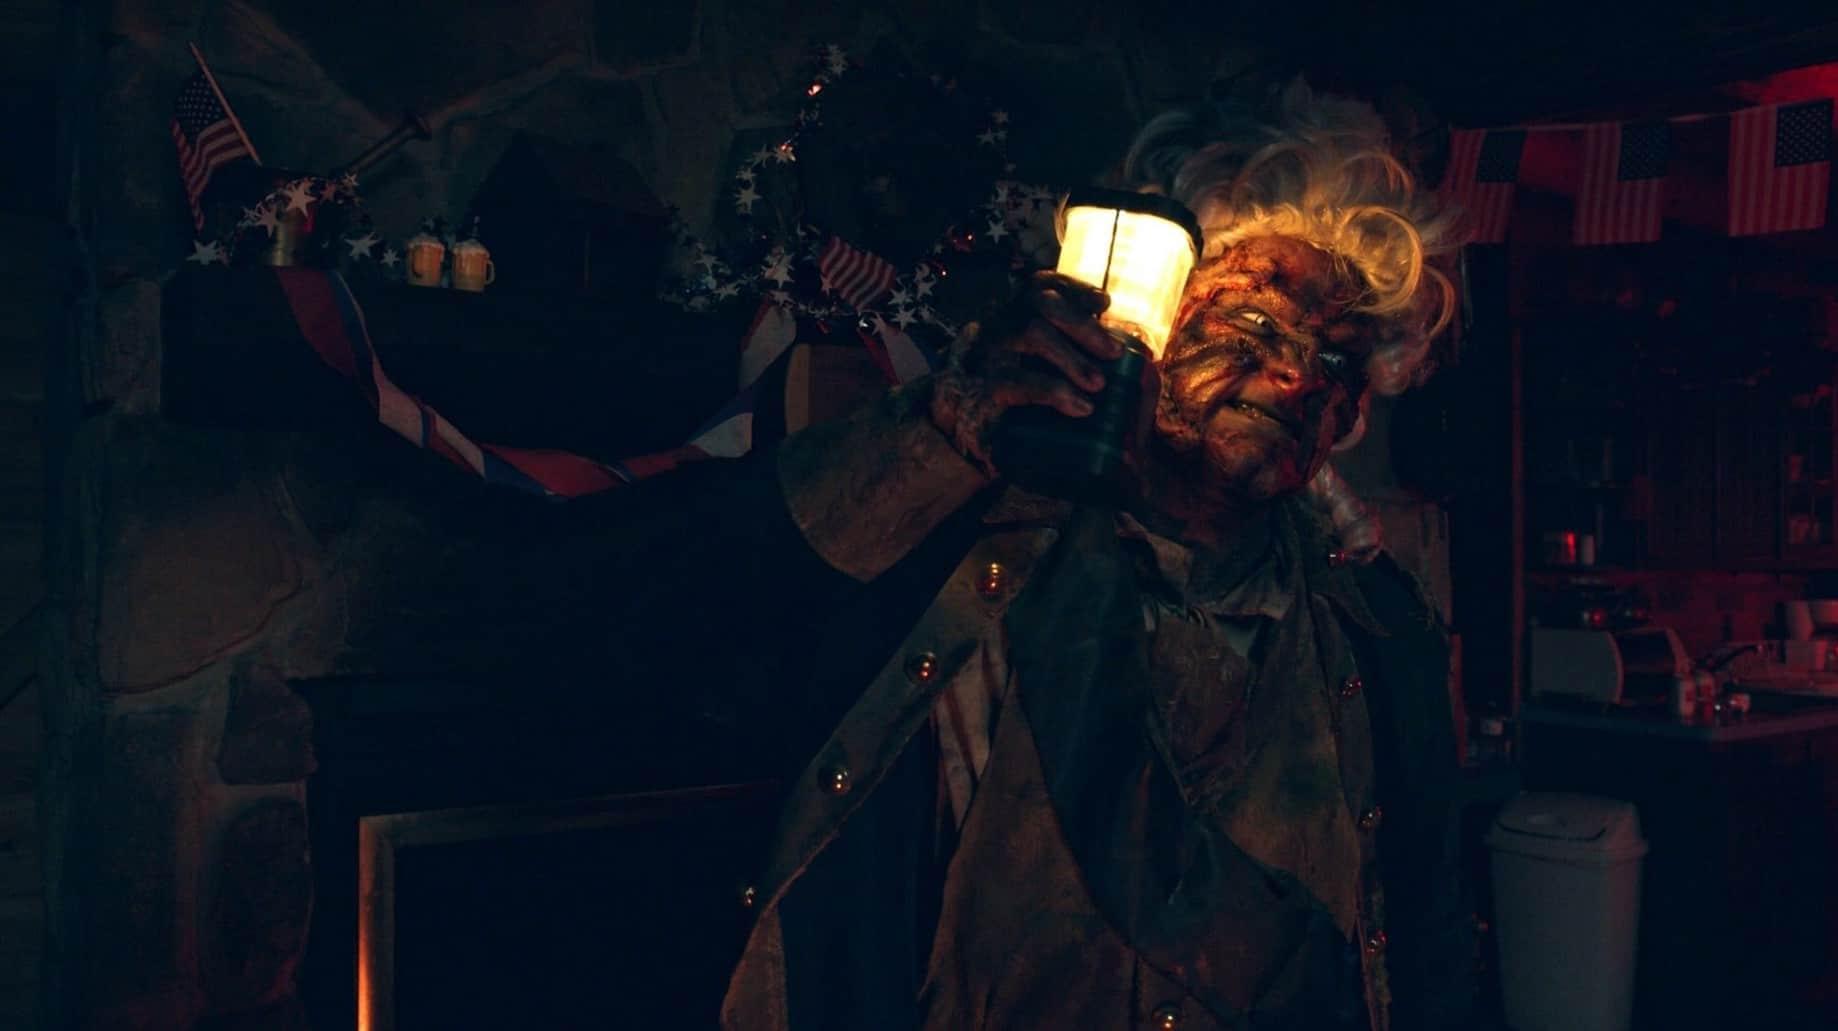 Joseph's Review: Re-Elected (Mr. HoleHead's Warped Dimension Film Fest)